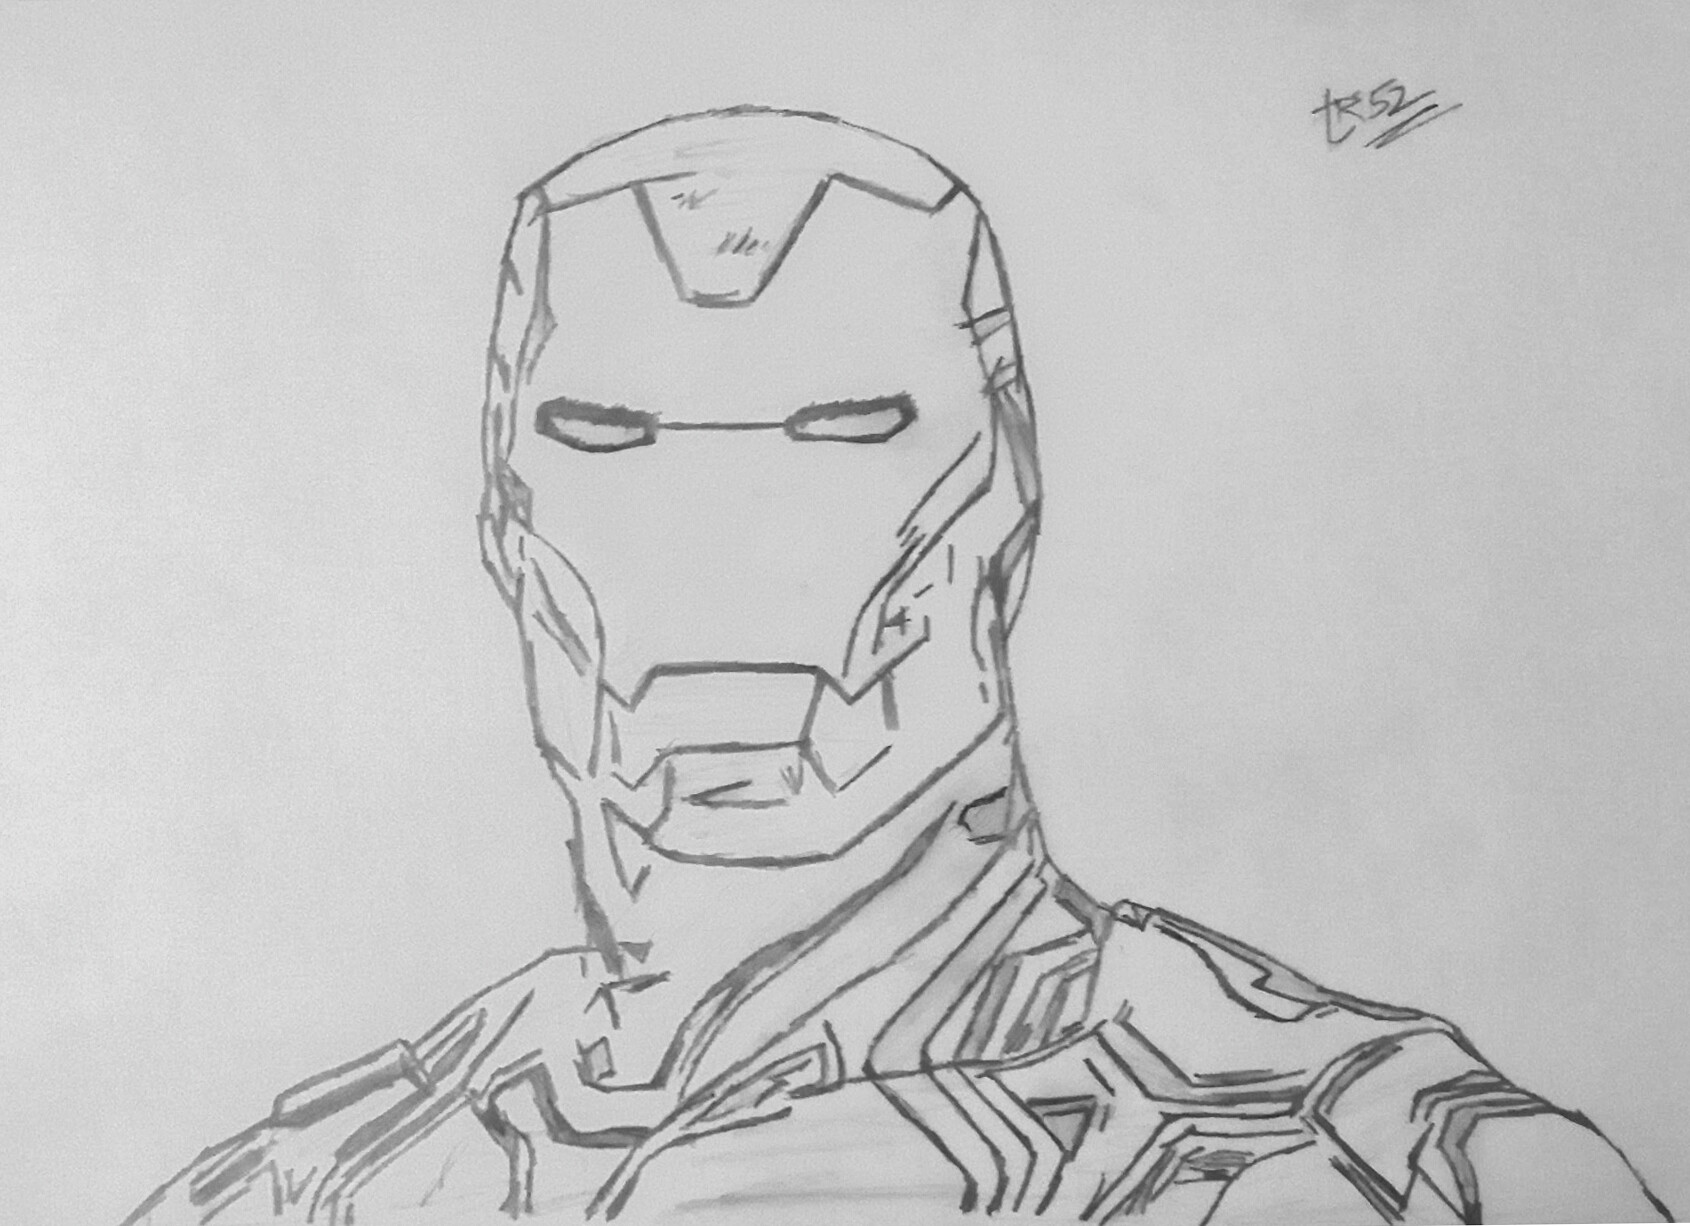 Artstation iron man mark l armor pencil sketch tr 52